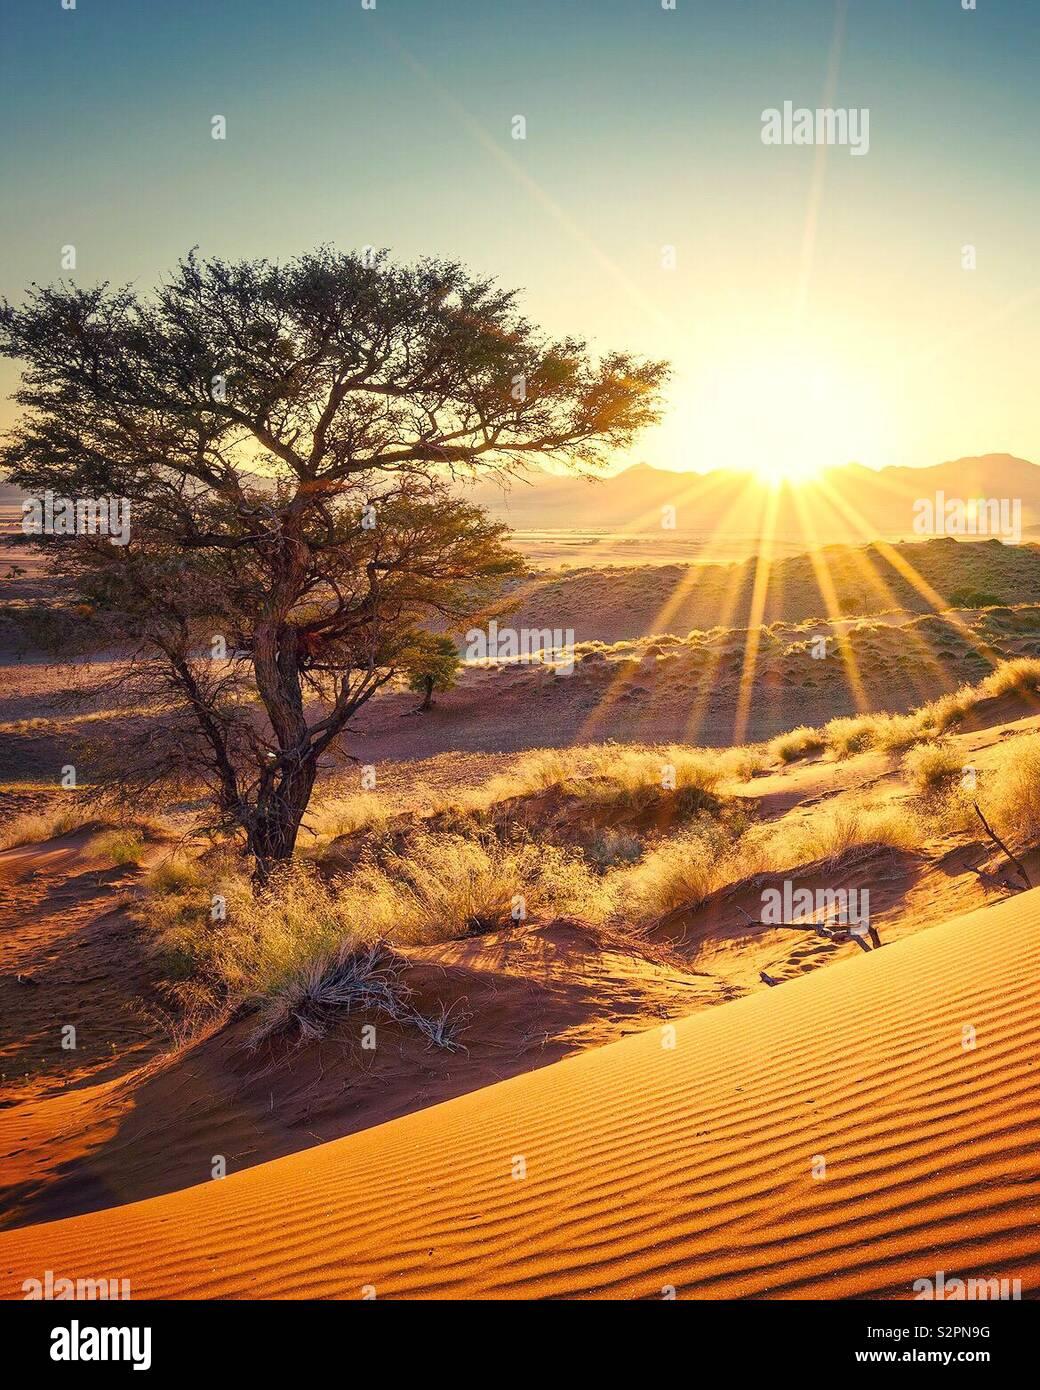 Sun se alzan en el desierto de Namibia Imagen De Stock